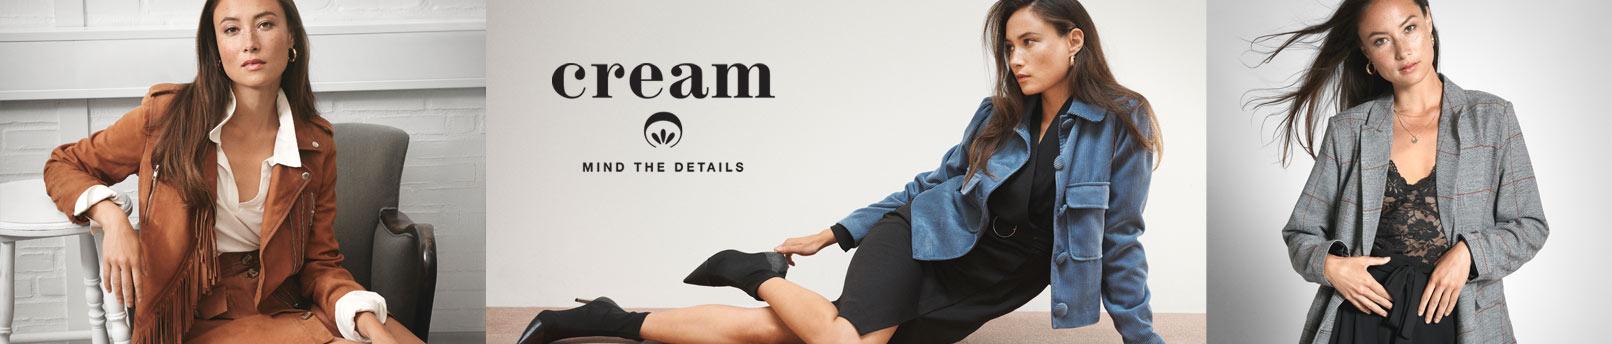 Discover Cream